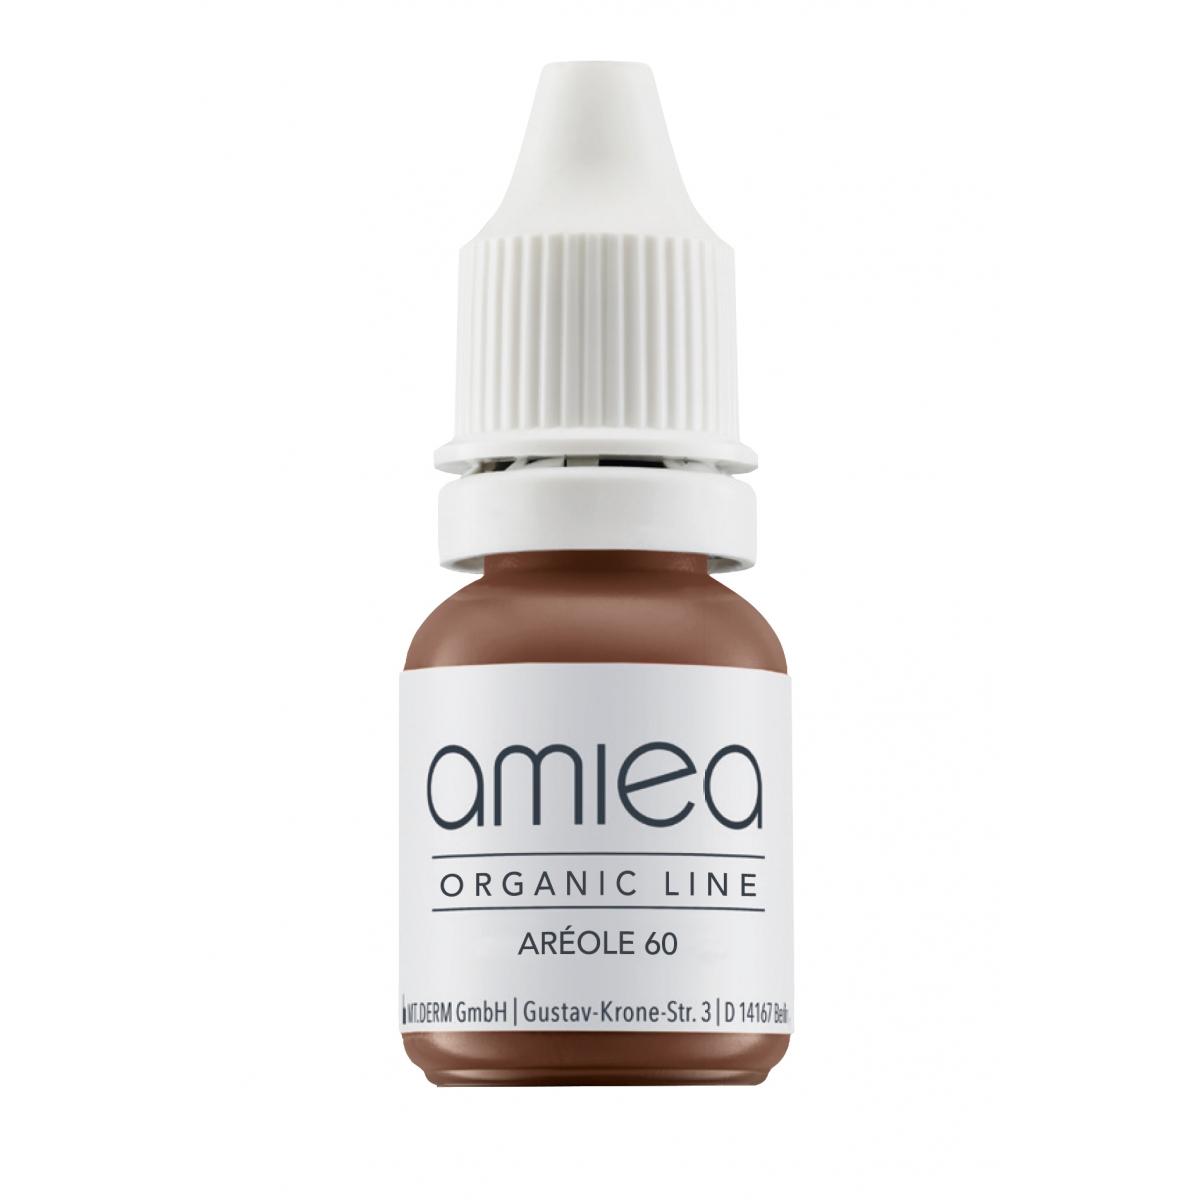 ORGANIC LINE (10ml) - PIGMENT AREOLES 60 ORGANICLINE AMIEA (10 ml)